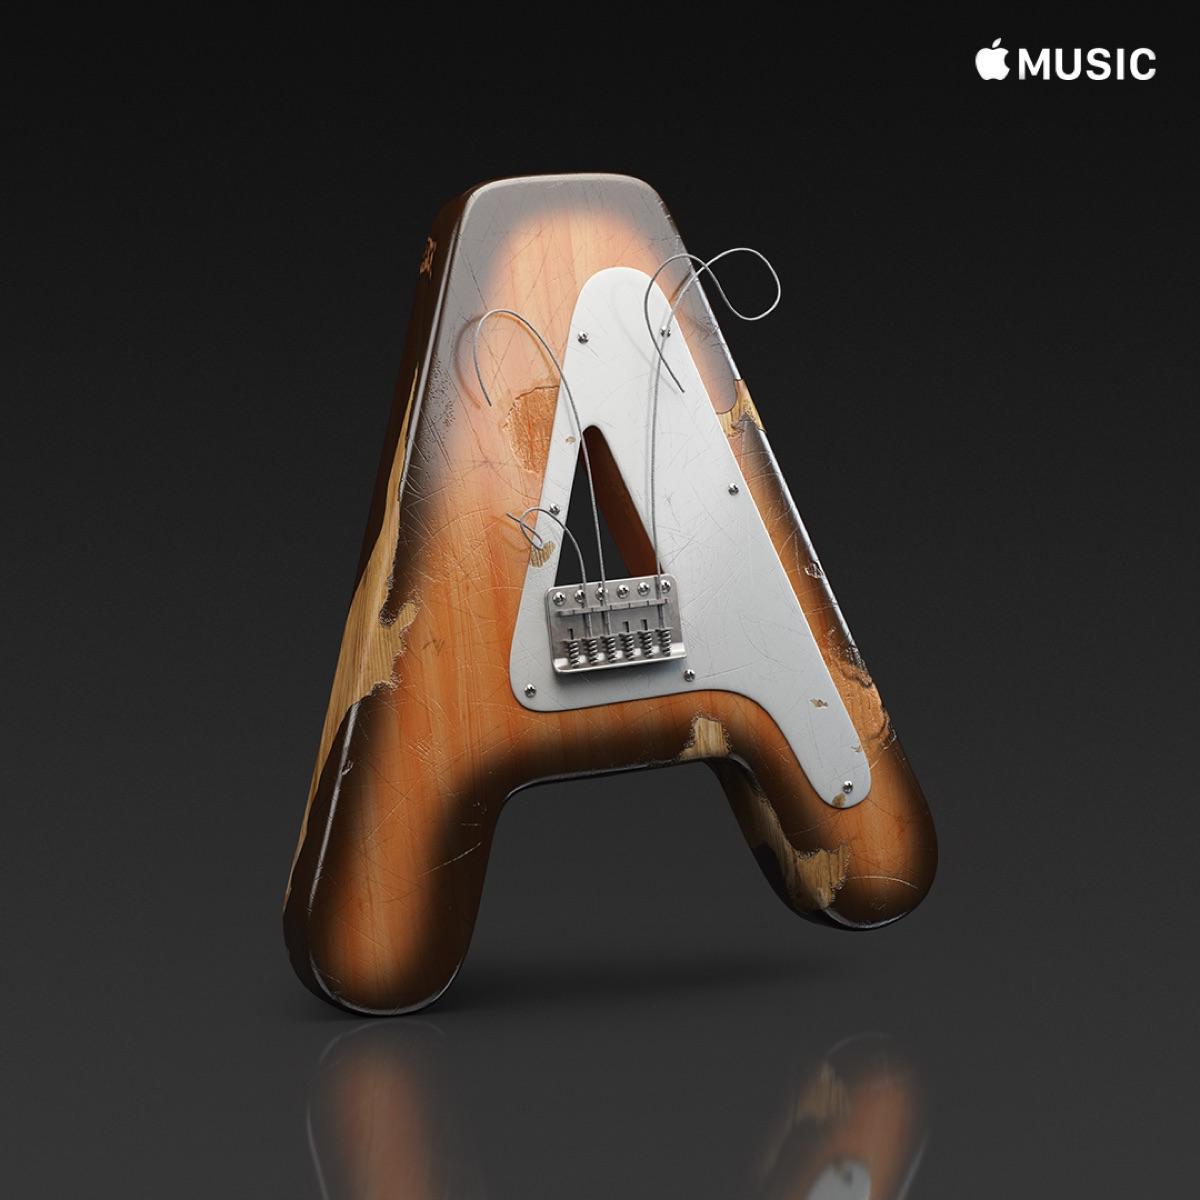 The A-List: Hard Rock on Apple Music